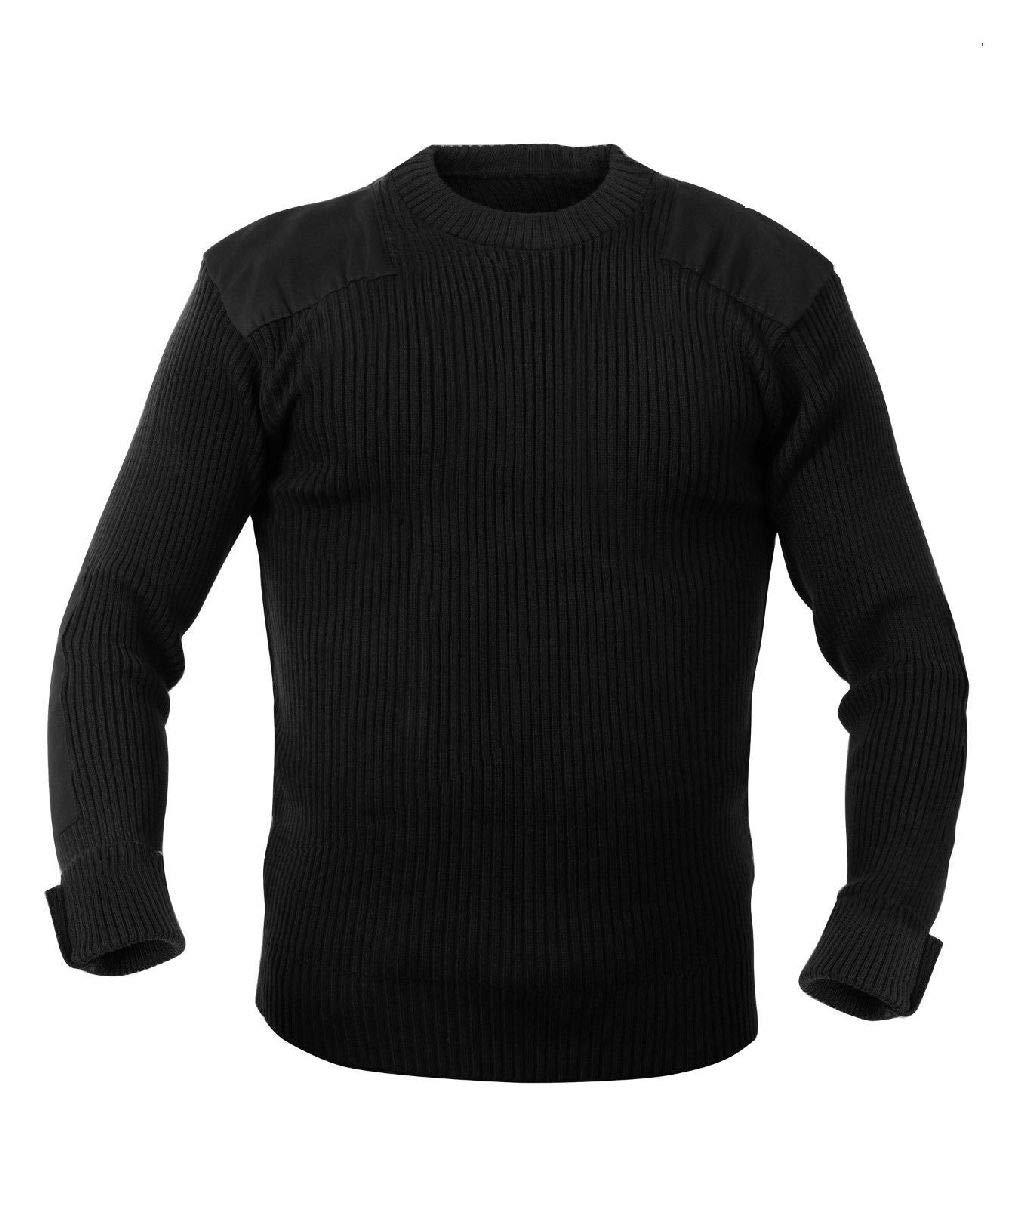 New Black Military Style Acrylic Tactical Commando Crewneck Sweater